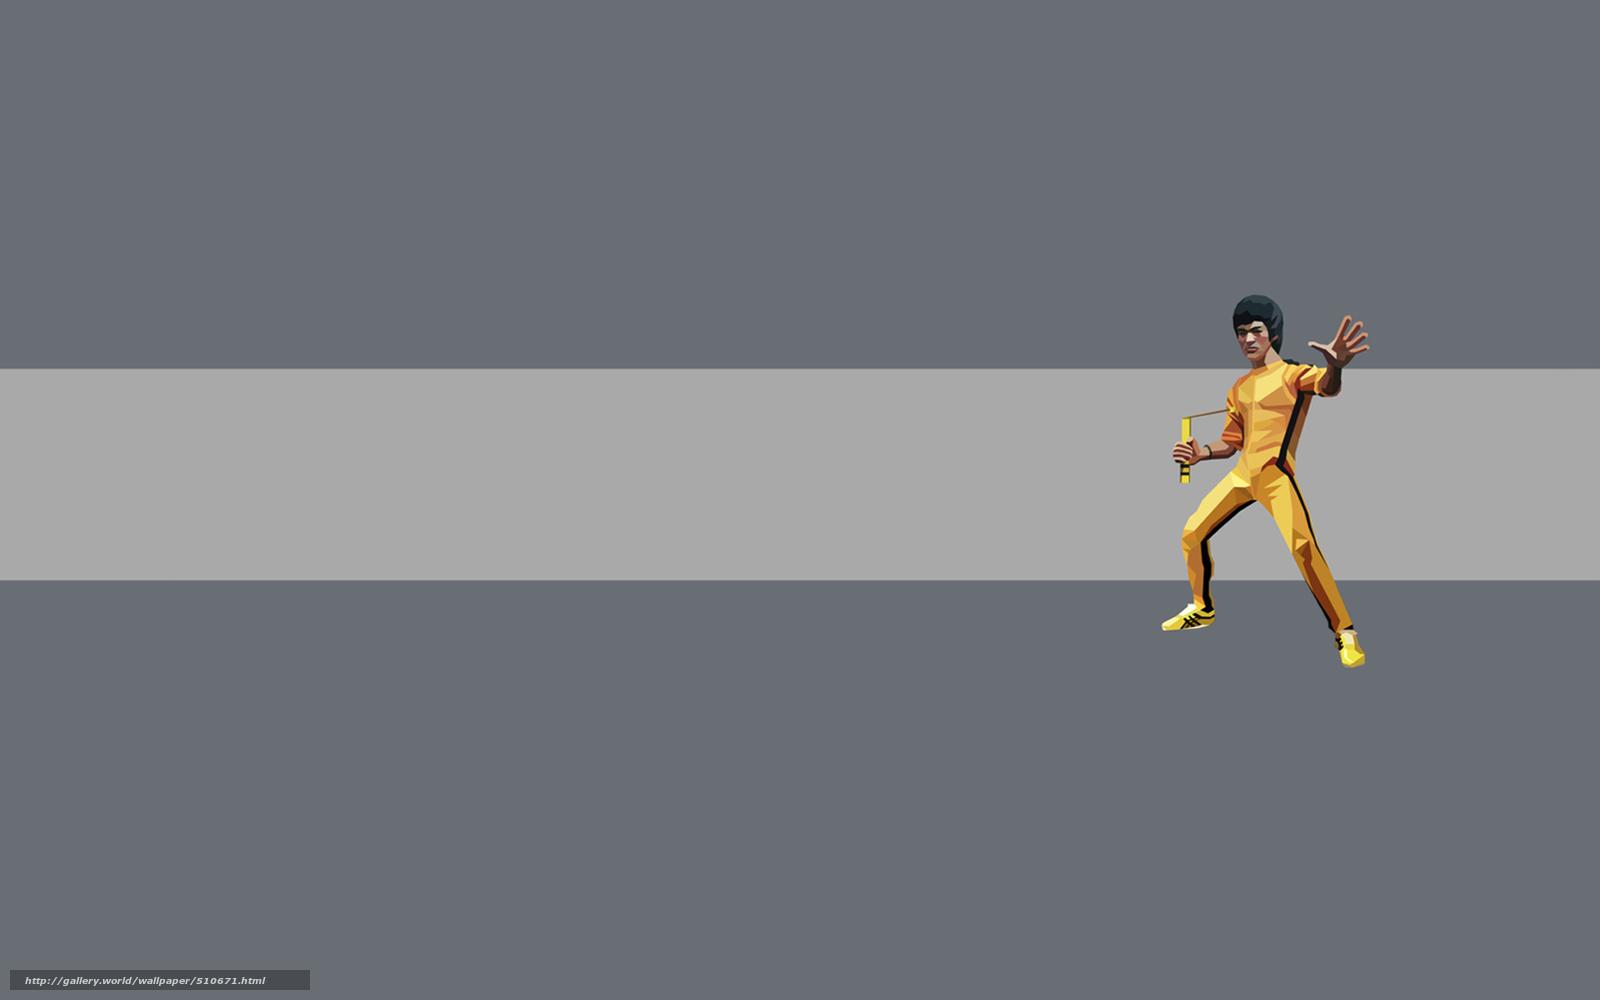 , fundo cinza, Kung Fu, banda, Bruce Lee, amarelo, homem, minimalismo